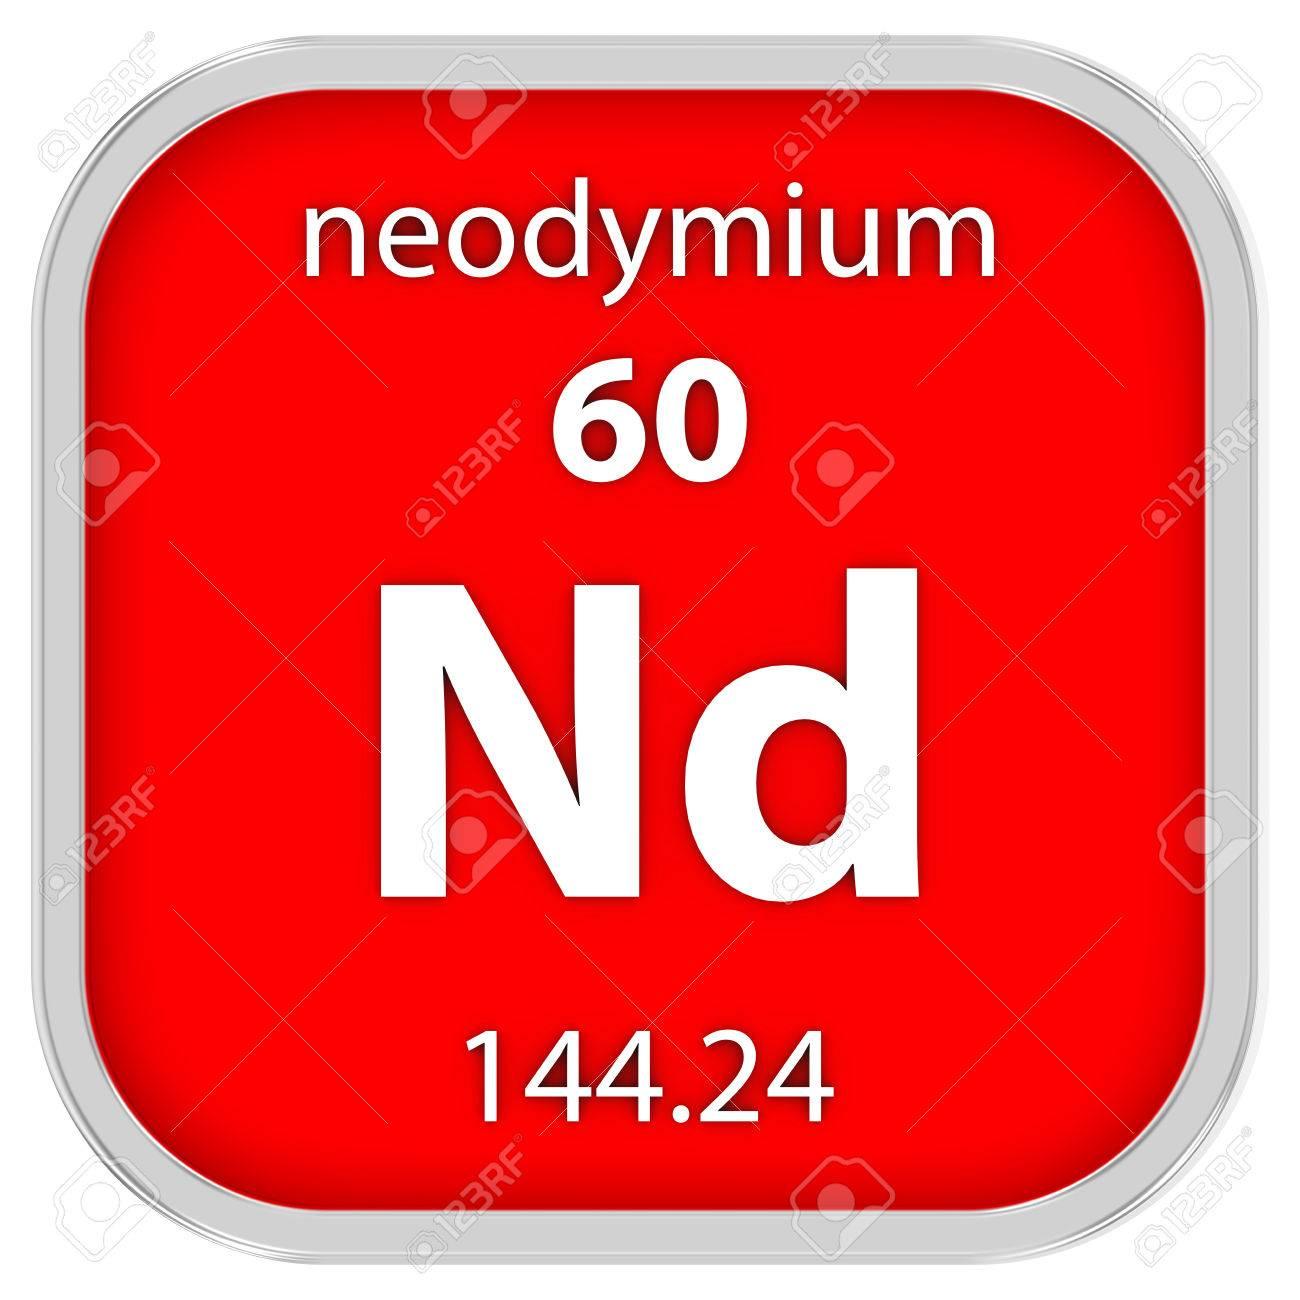 Neodymium material on the periodic table stock photo picture and neodymium material on the periodic table stock photo 41158689 gamestrikefo Choice Image